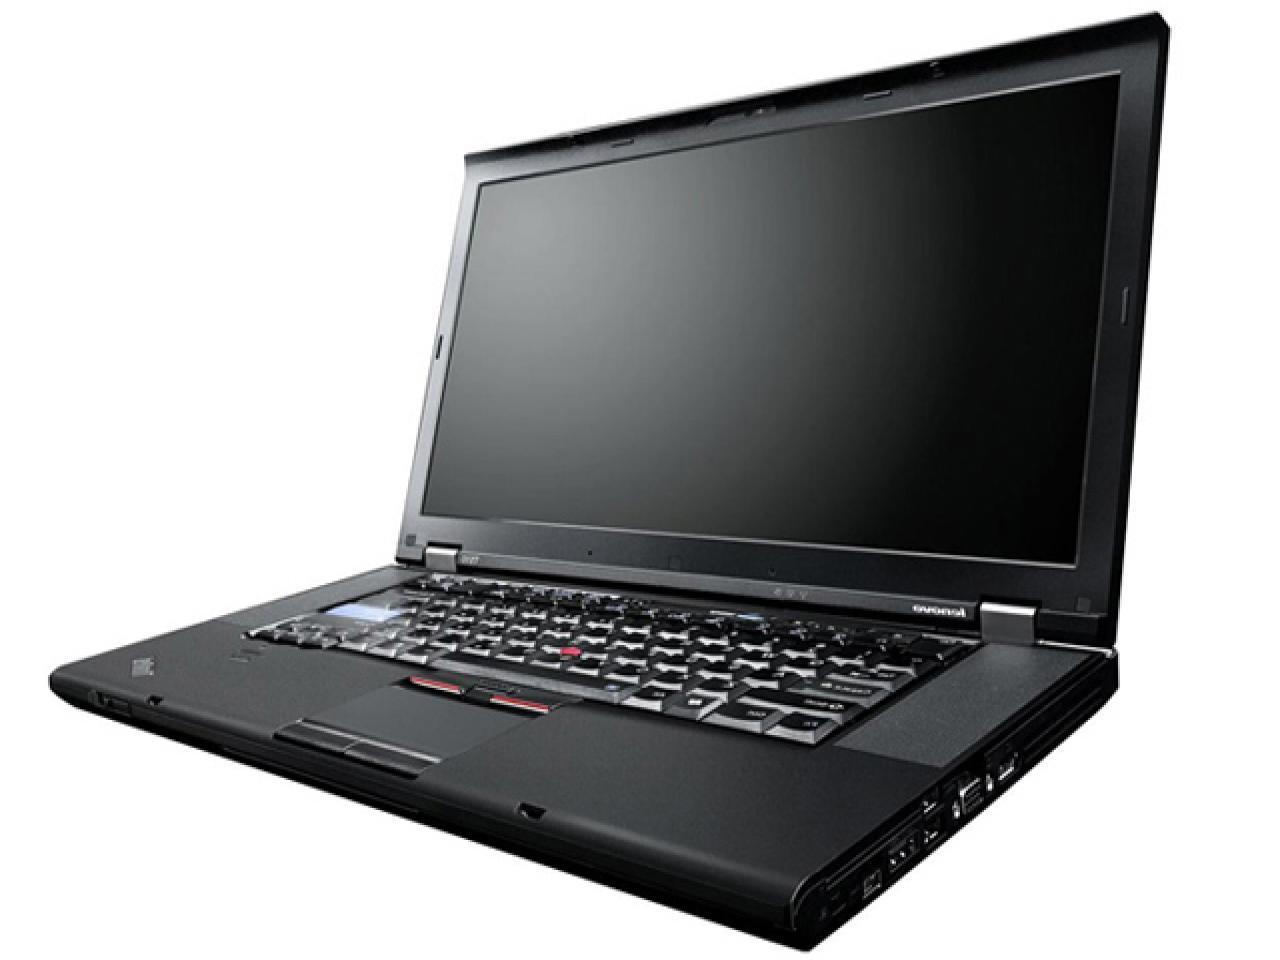 Lenovo ThinkPad T510  - shop.bb-net.de